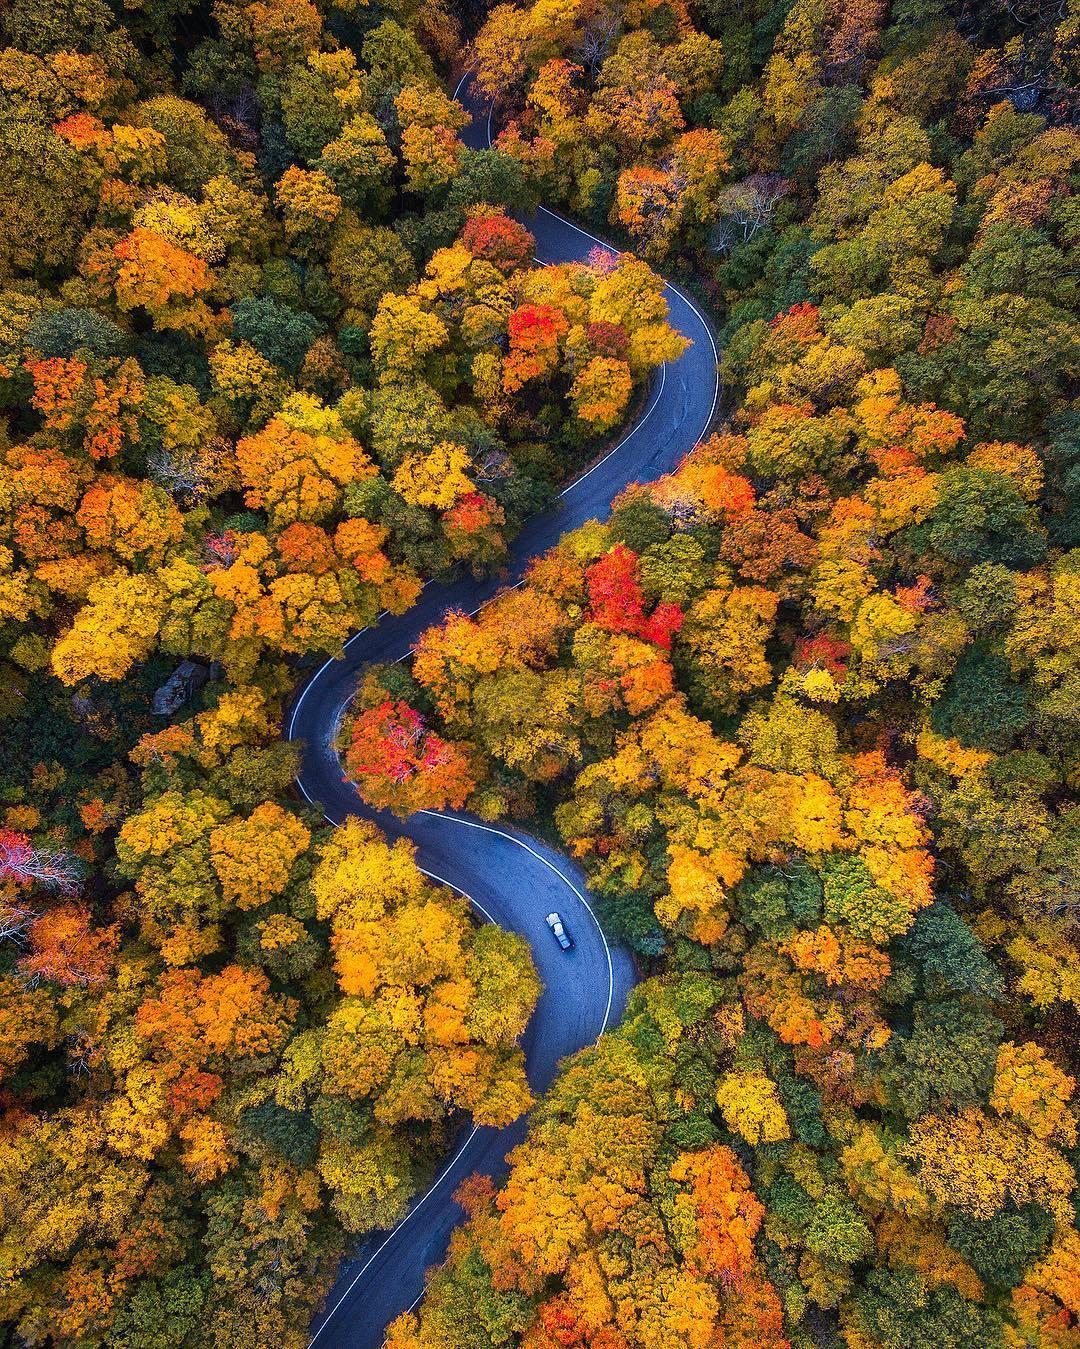 Windy fall drives in Vermont | Photo by Michael Matti (@michaelmatti on IG) https://t.co/huItTI0v4c